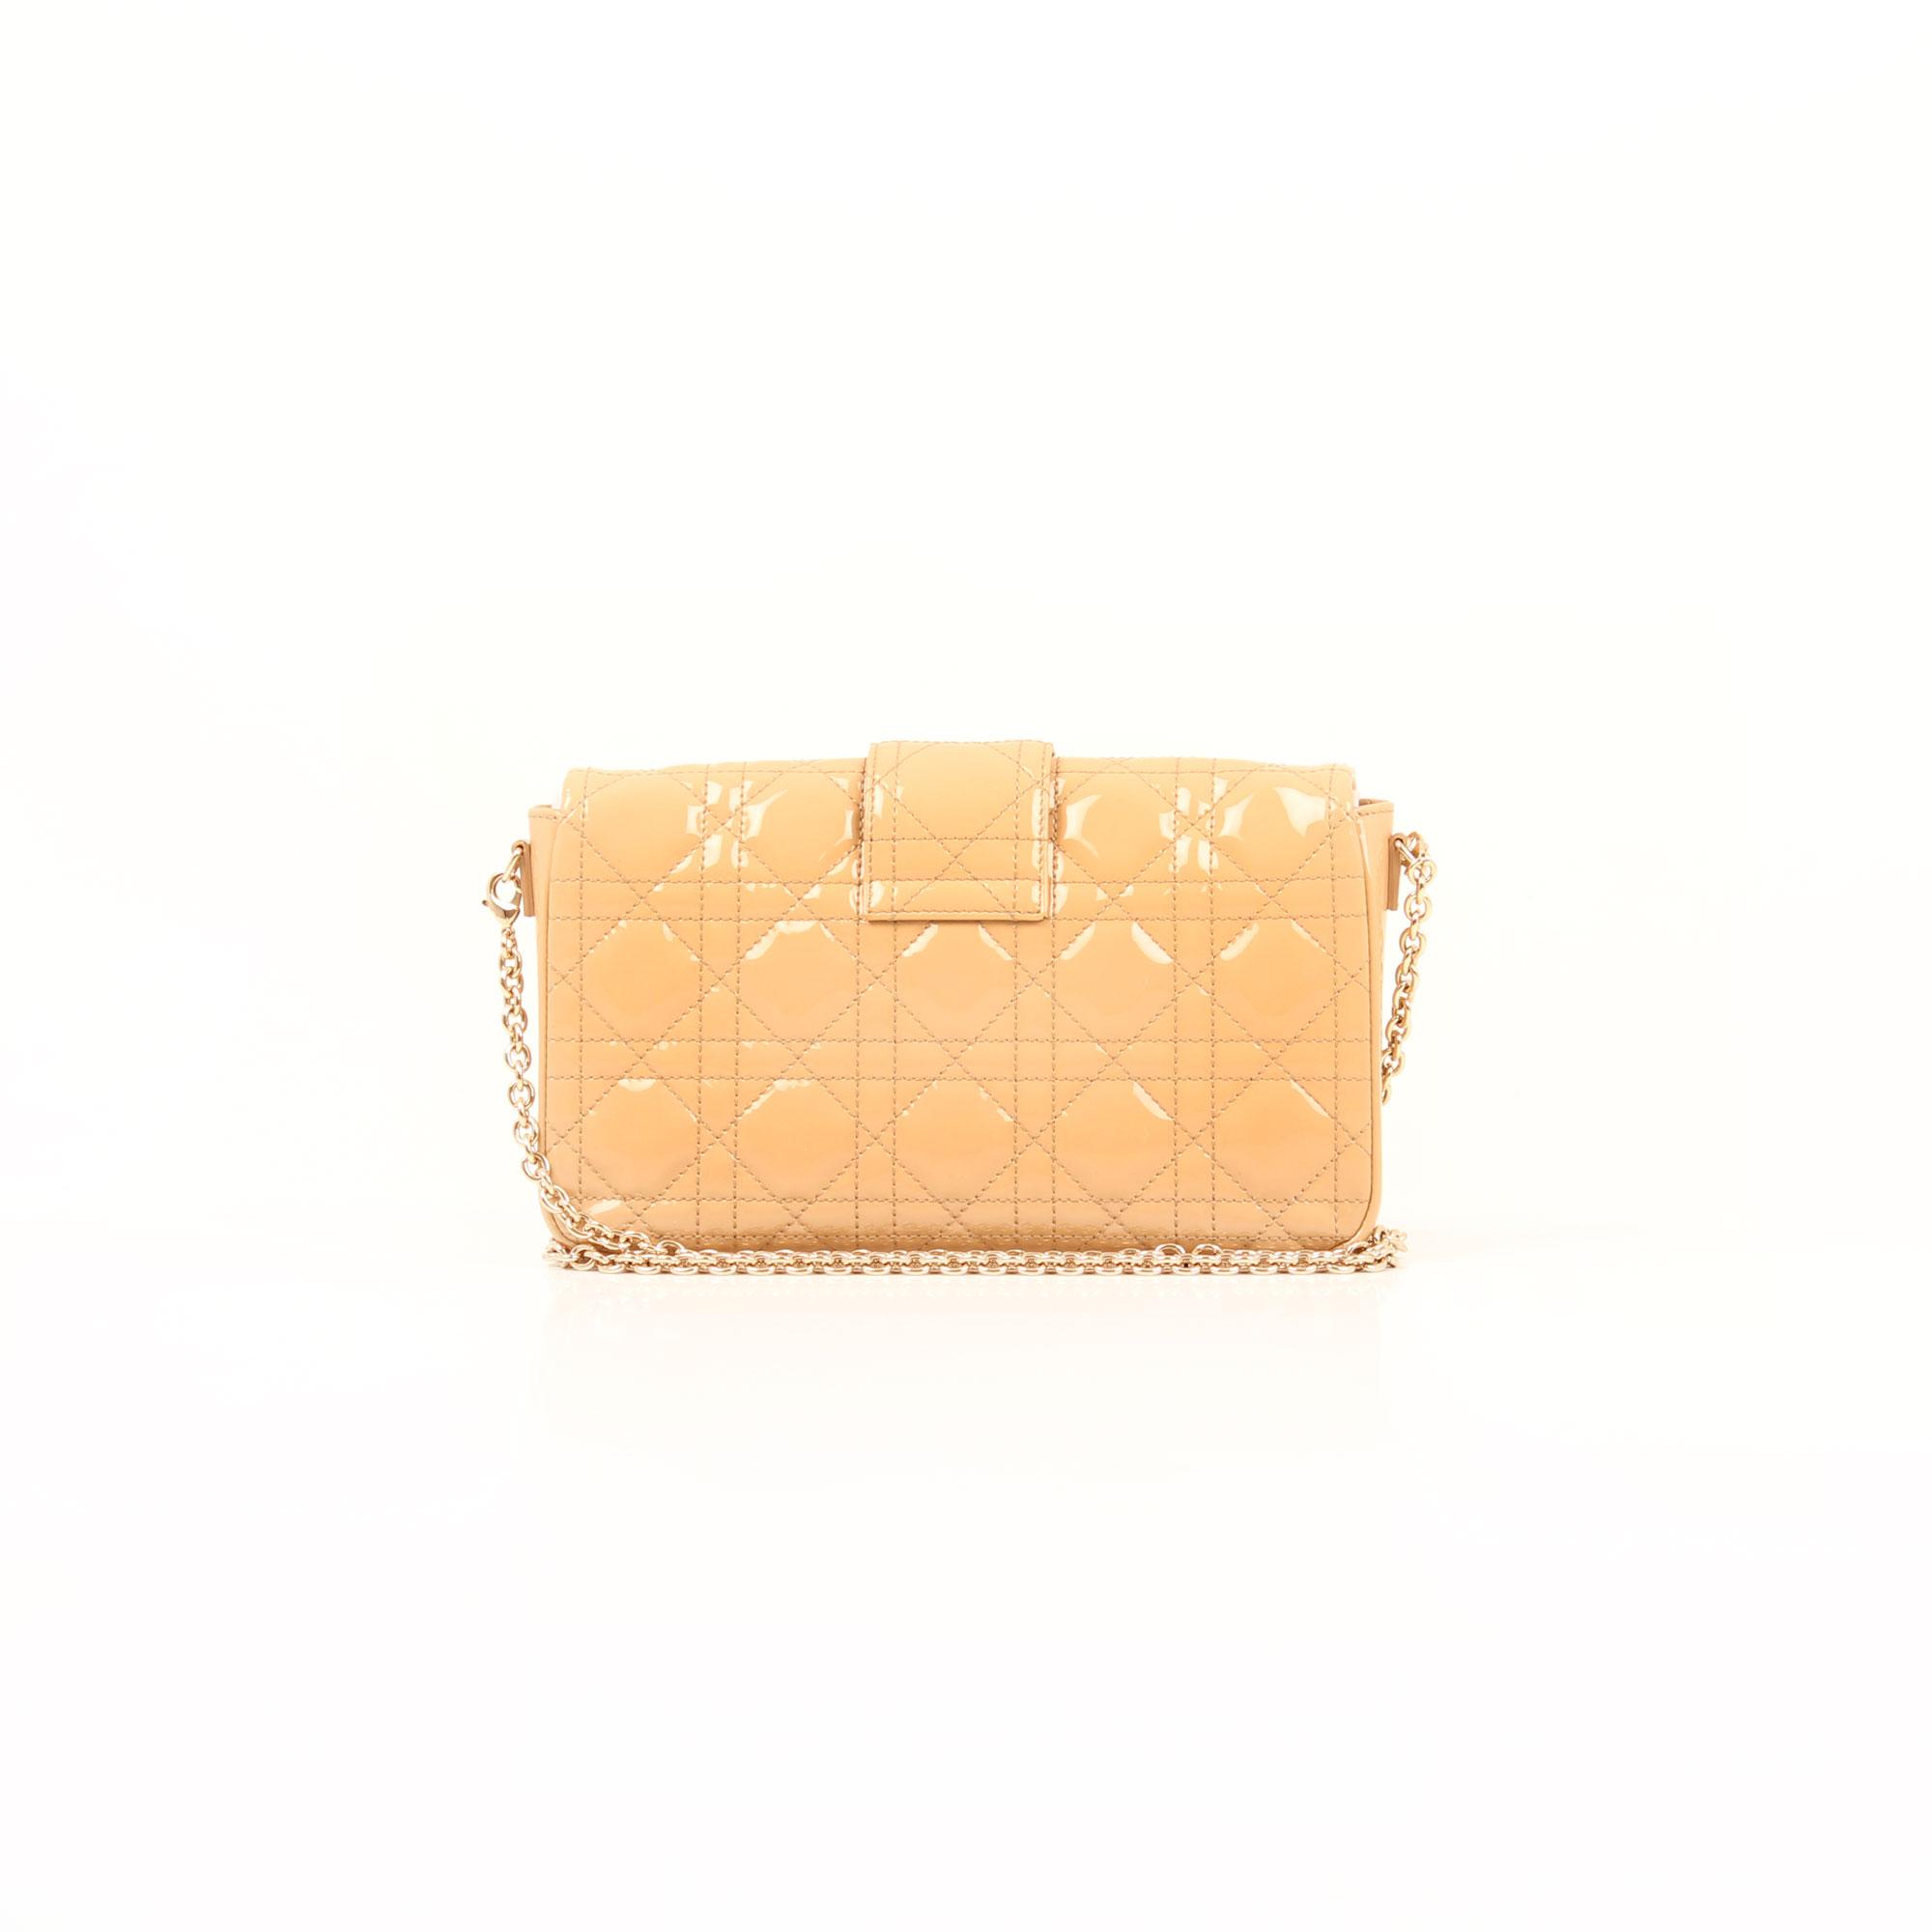 Back image of miss dior new look promenade charol beige